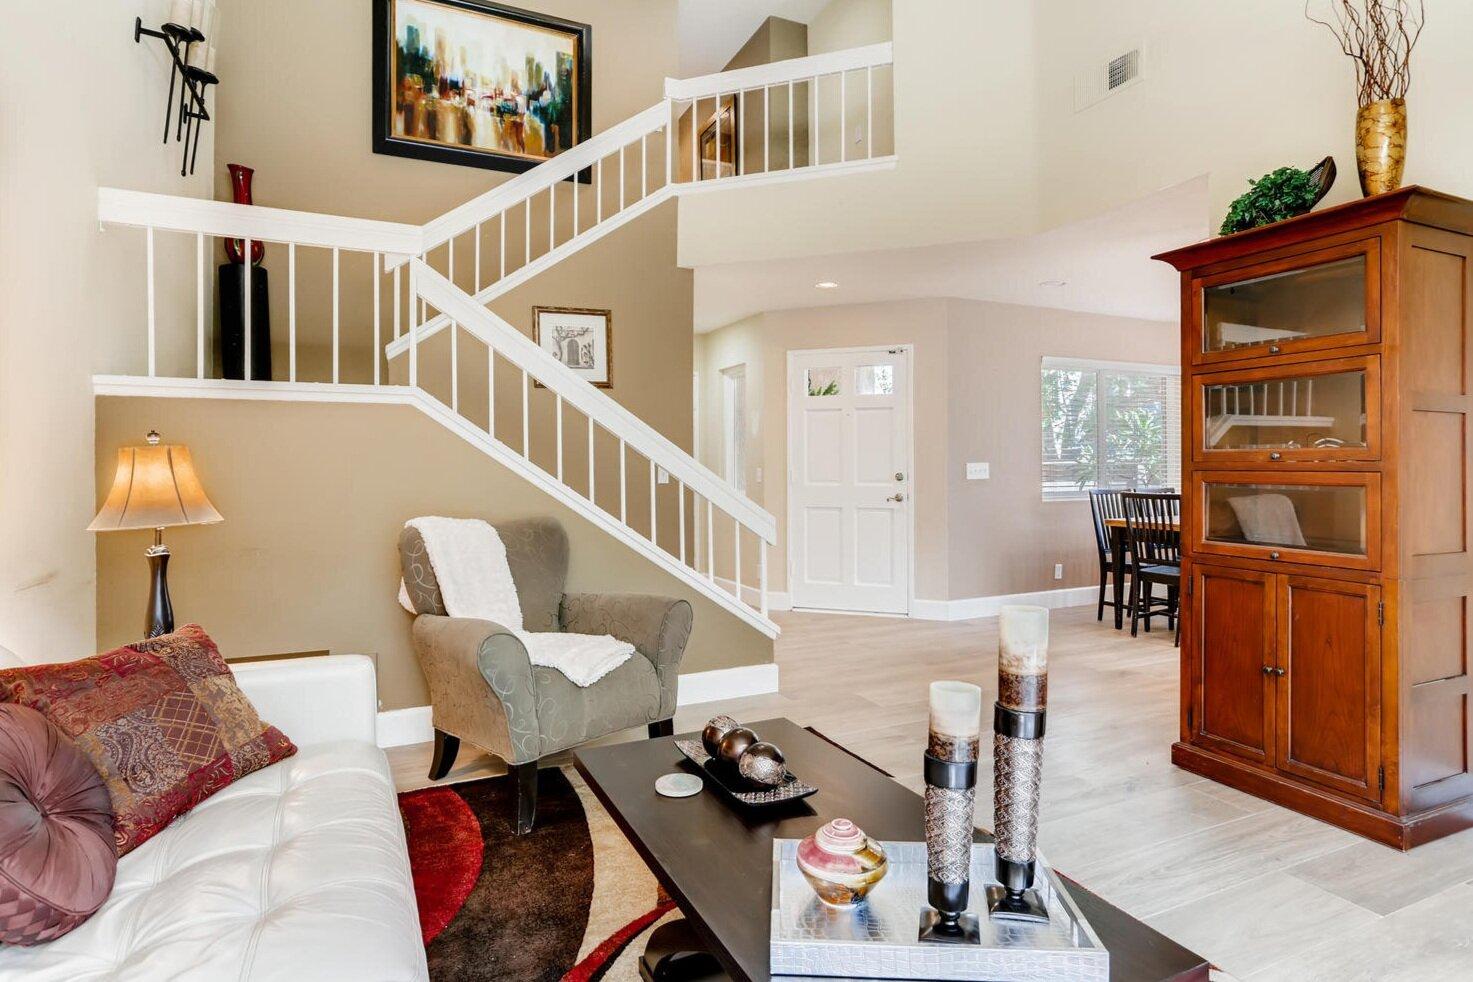 2+Firwood+Aliso+Viejo+CA+92656-large-004-030-Living+Room-1500x1000-72dpi.jpg